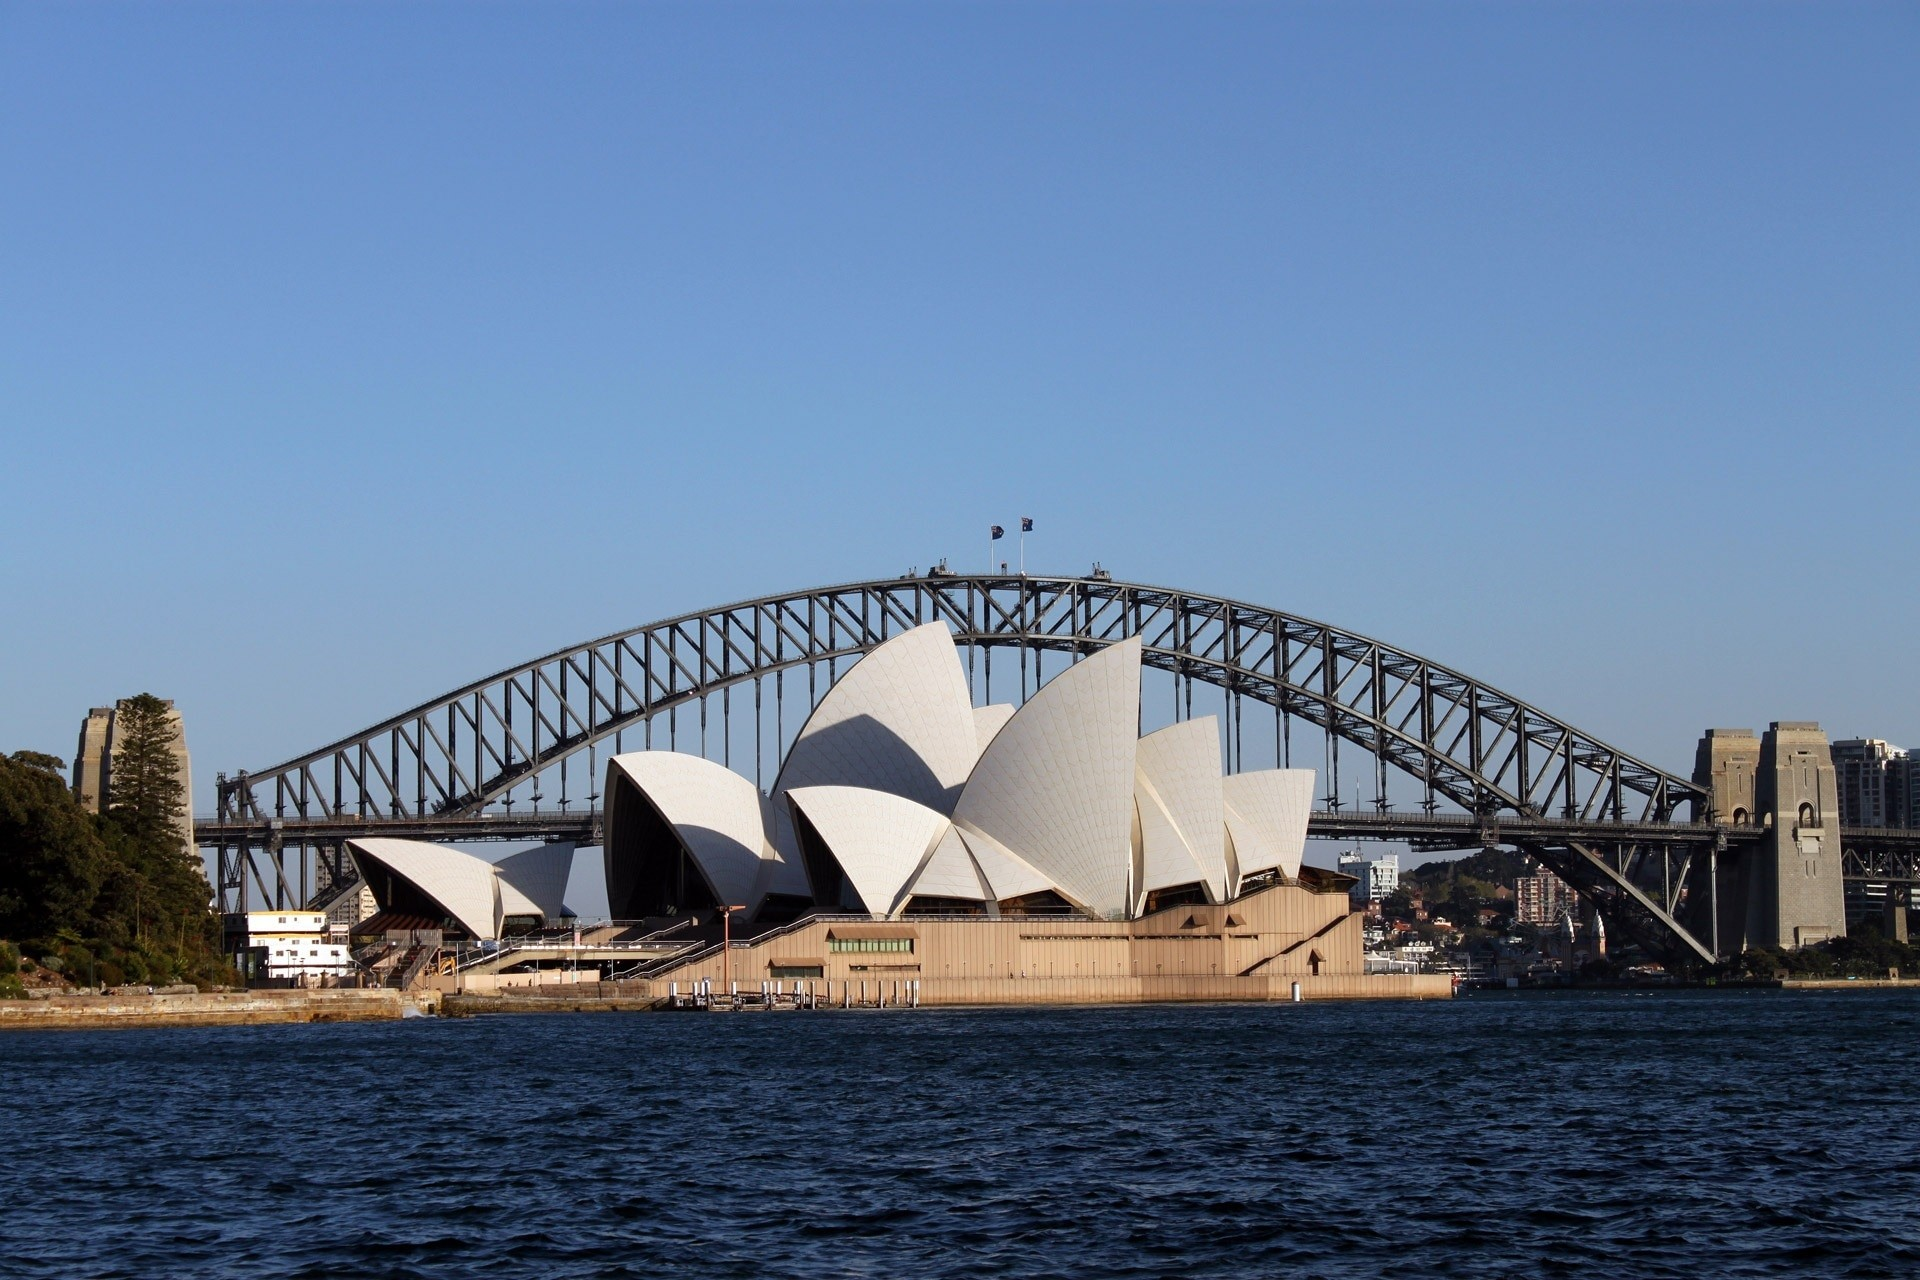 1920x1200 Sydney Opera House Wallpaper Â« Beach & Travels Â« HD Wallpapers